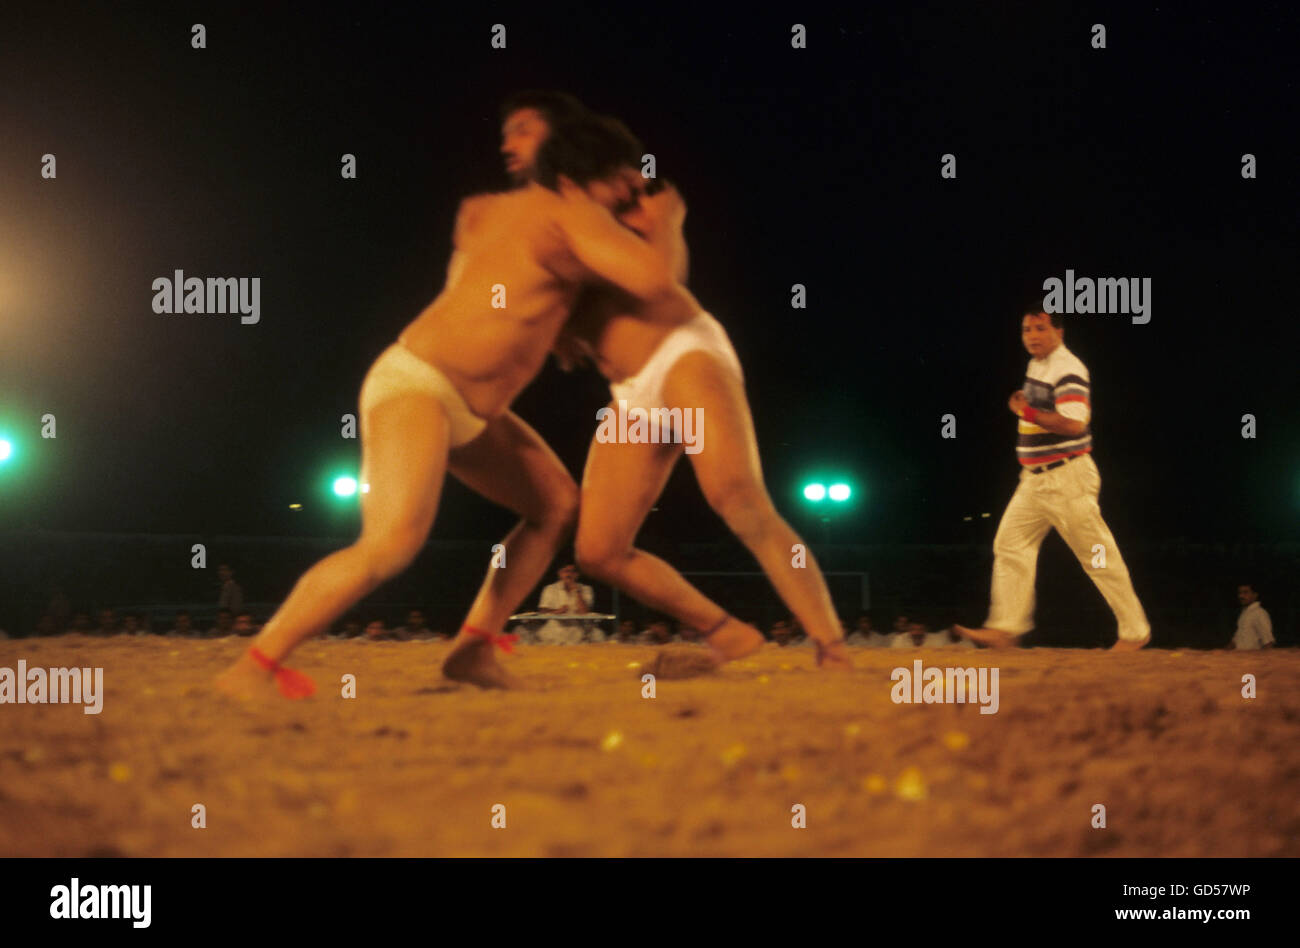 Wrestlers practising - Stock Image